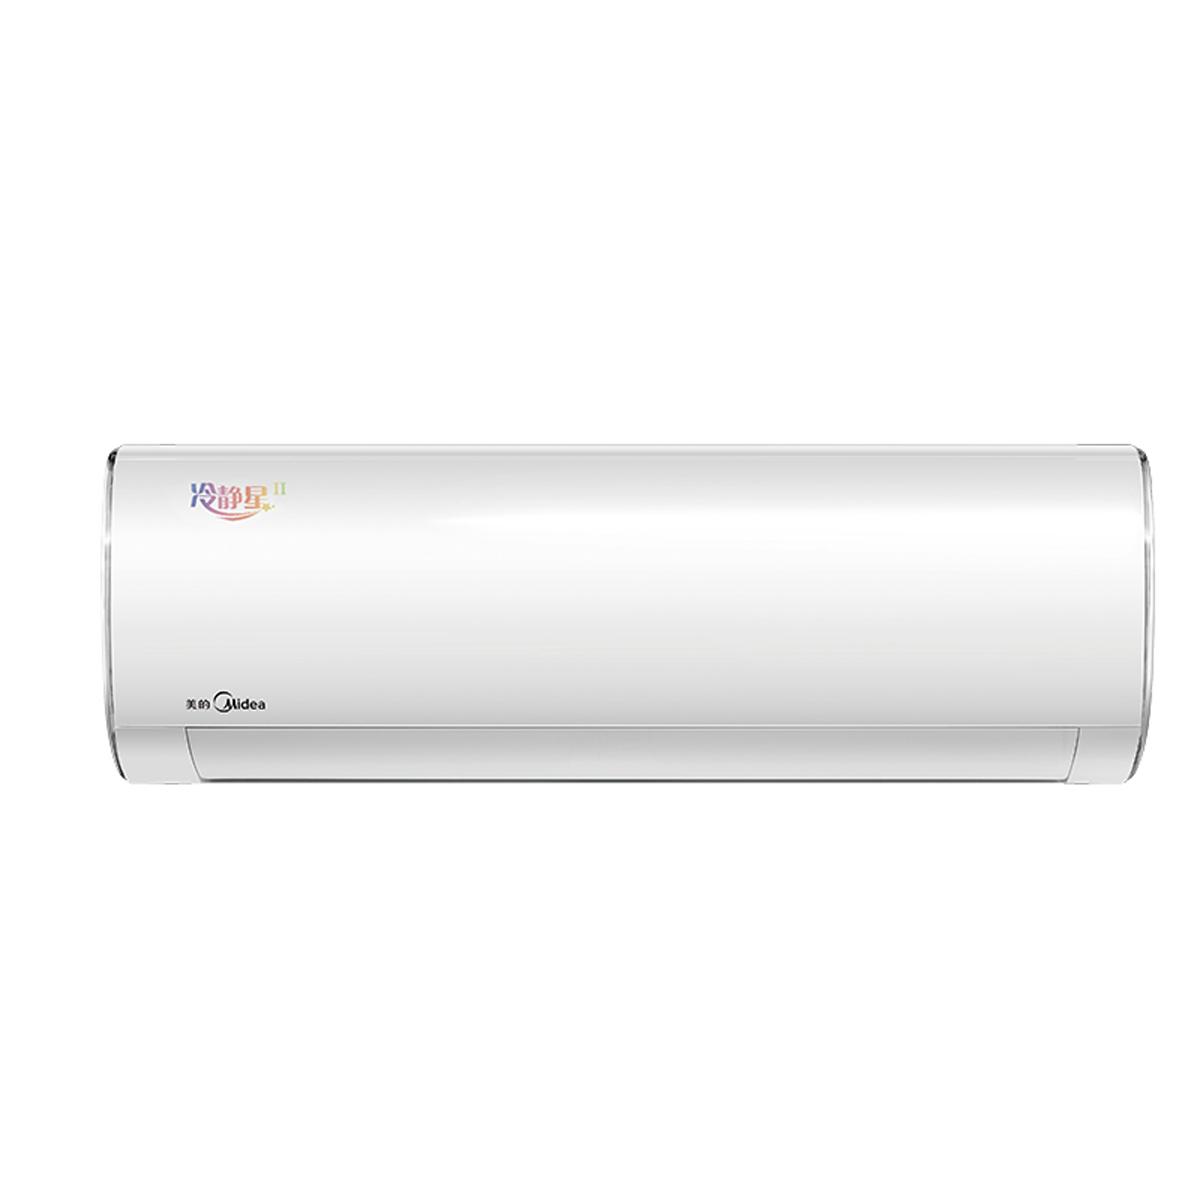 Midea/美的 KFR-26GW/BP3DN8Y-PH200(B1)家用空调套机 说明书.pdf